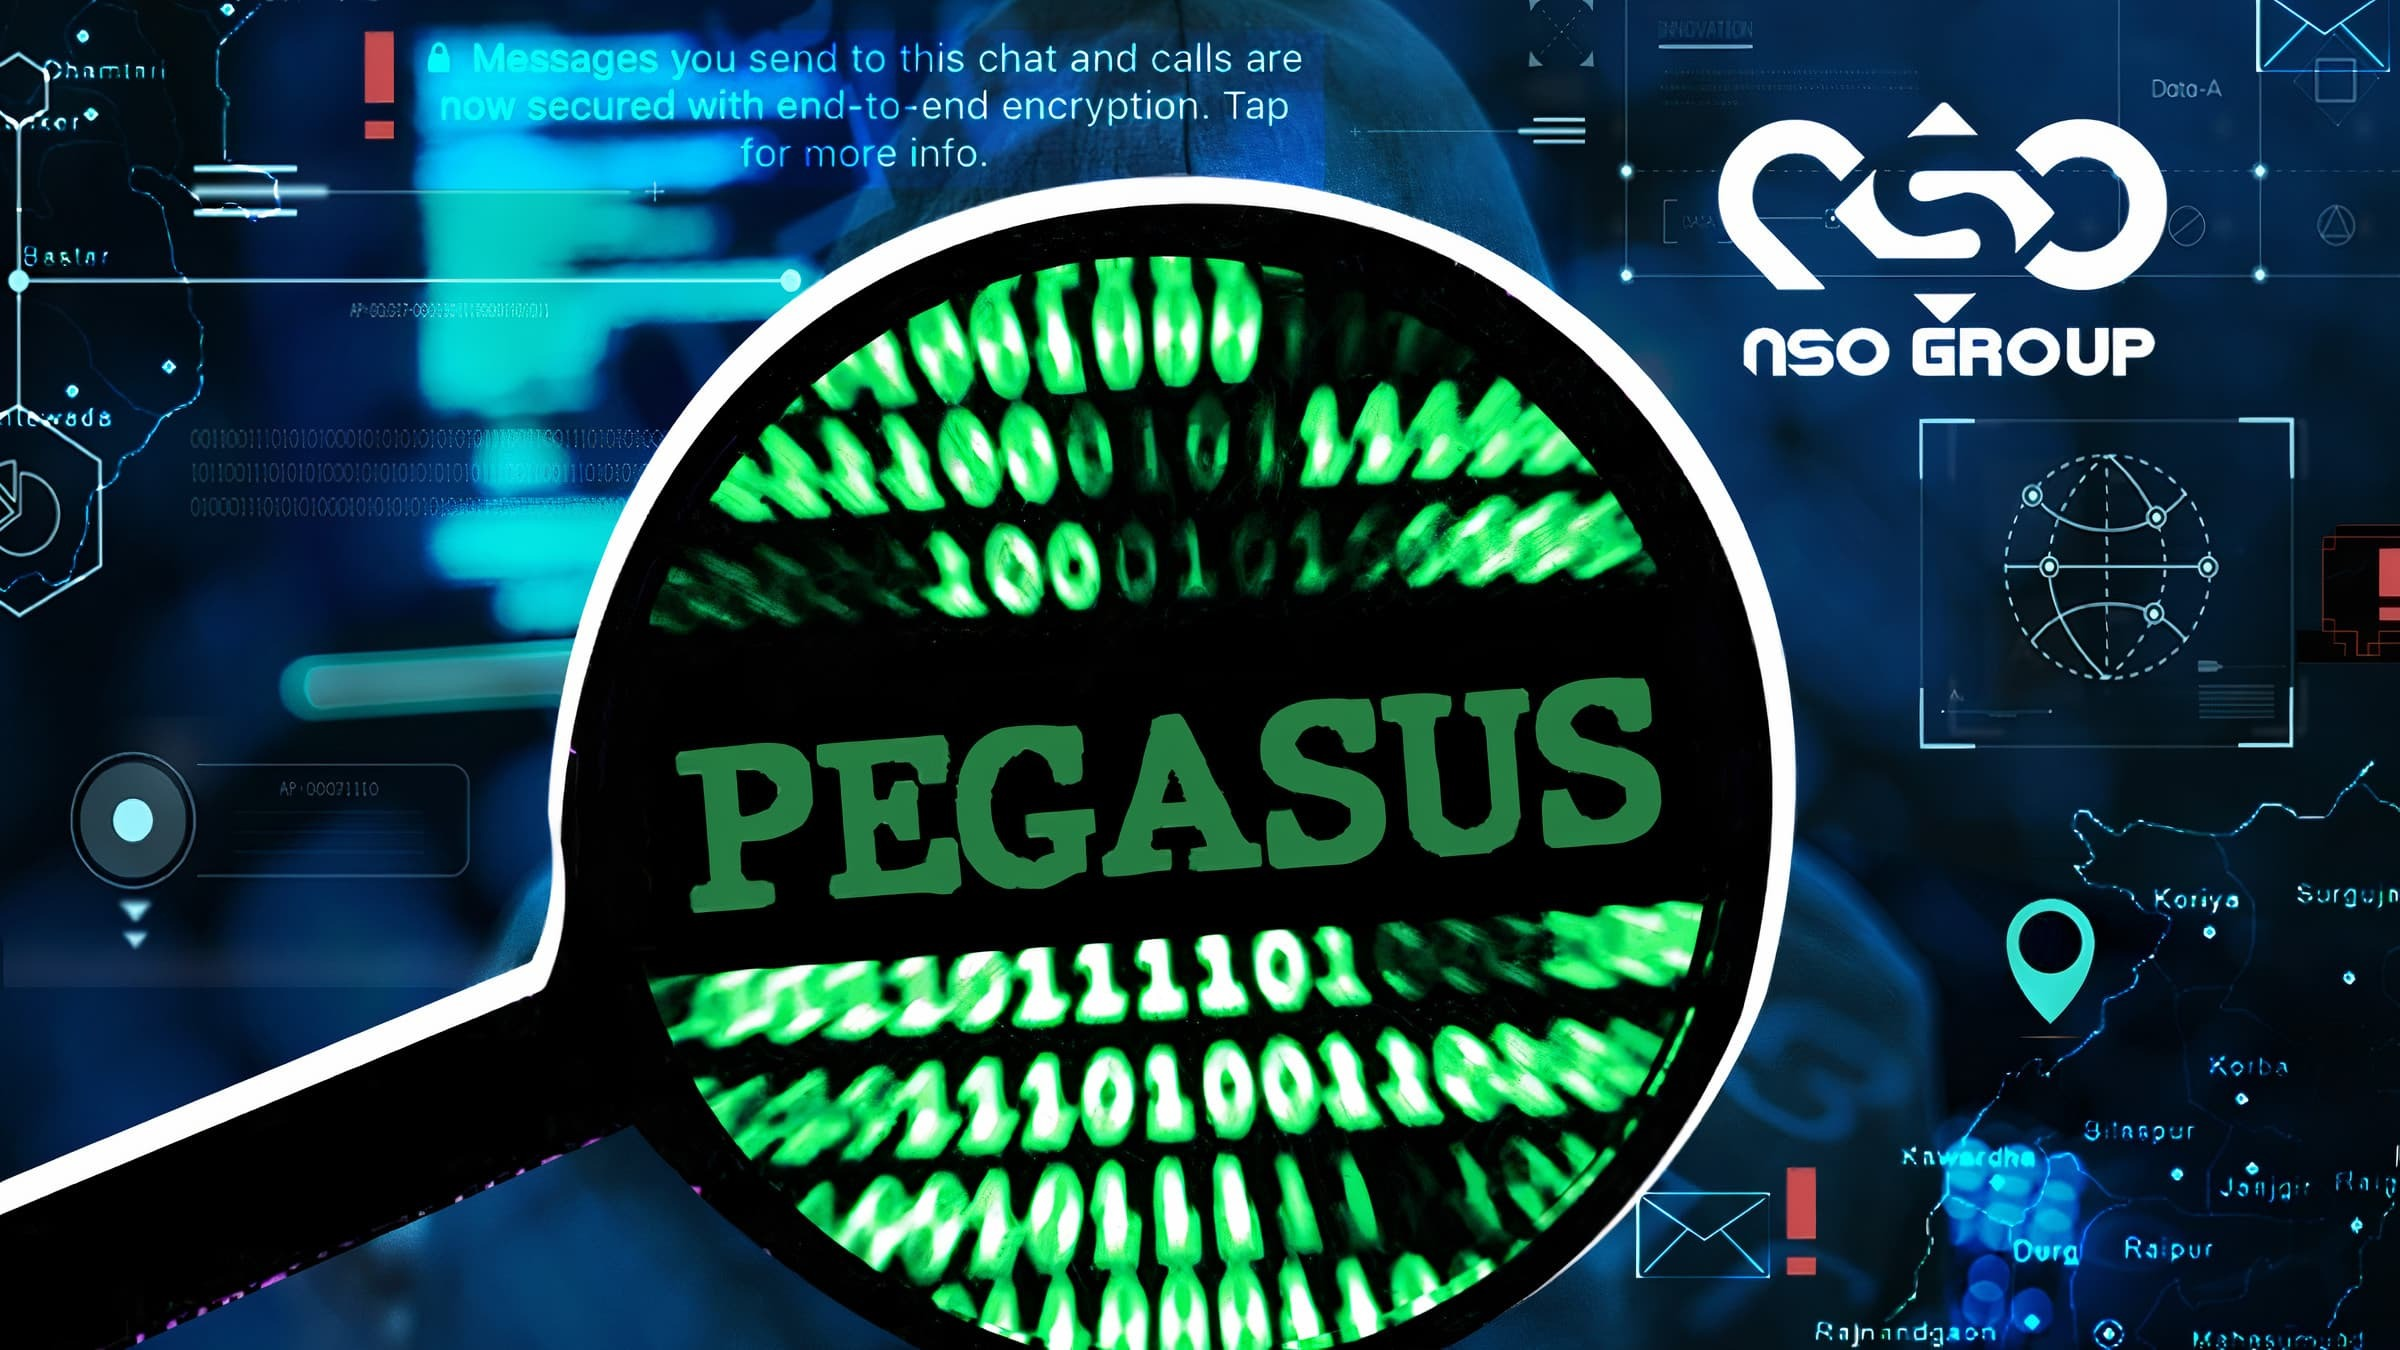 Pegasus Spyware Illustration Image